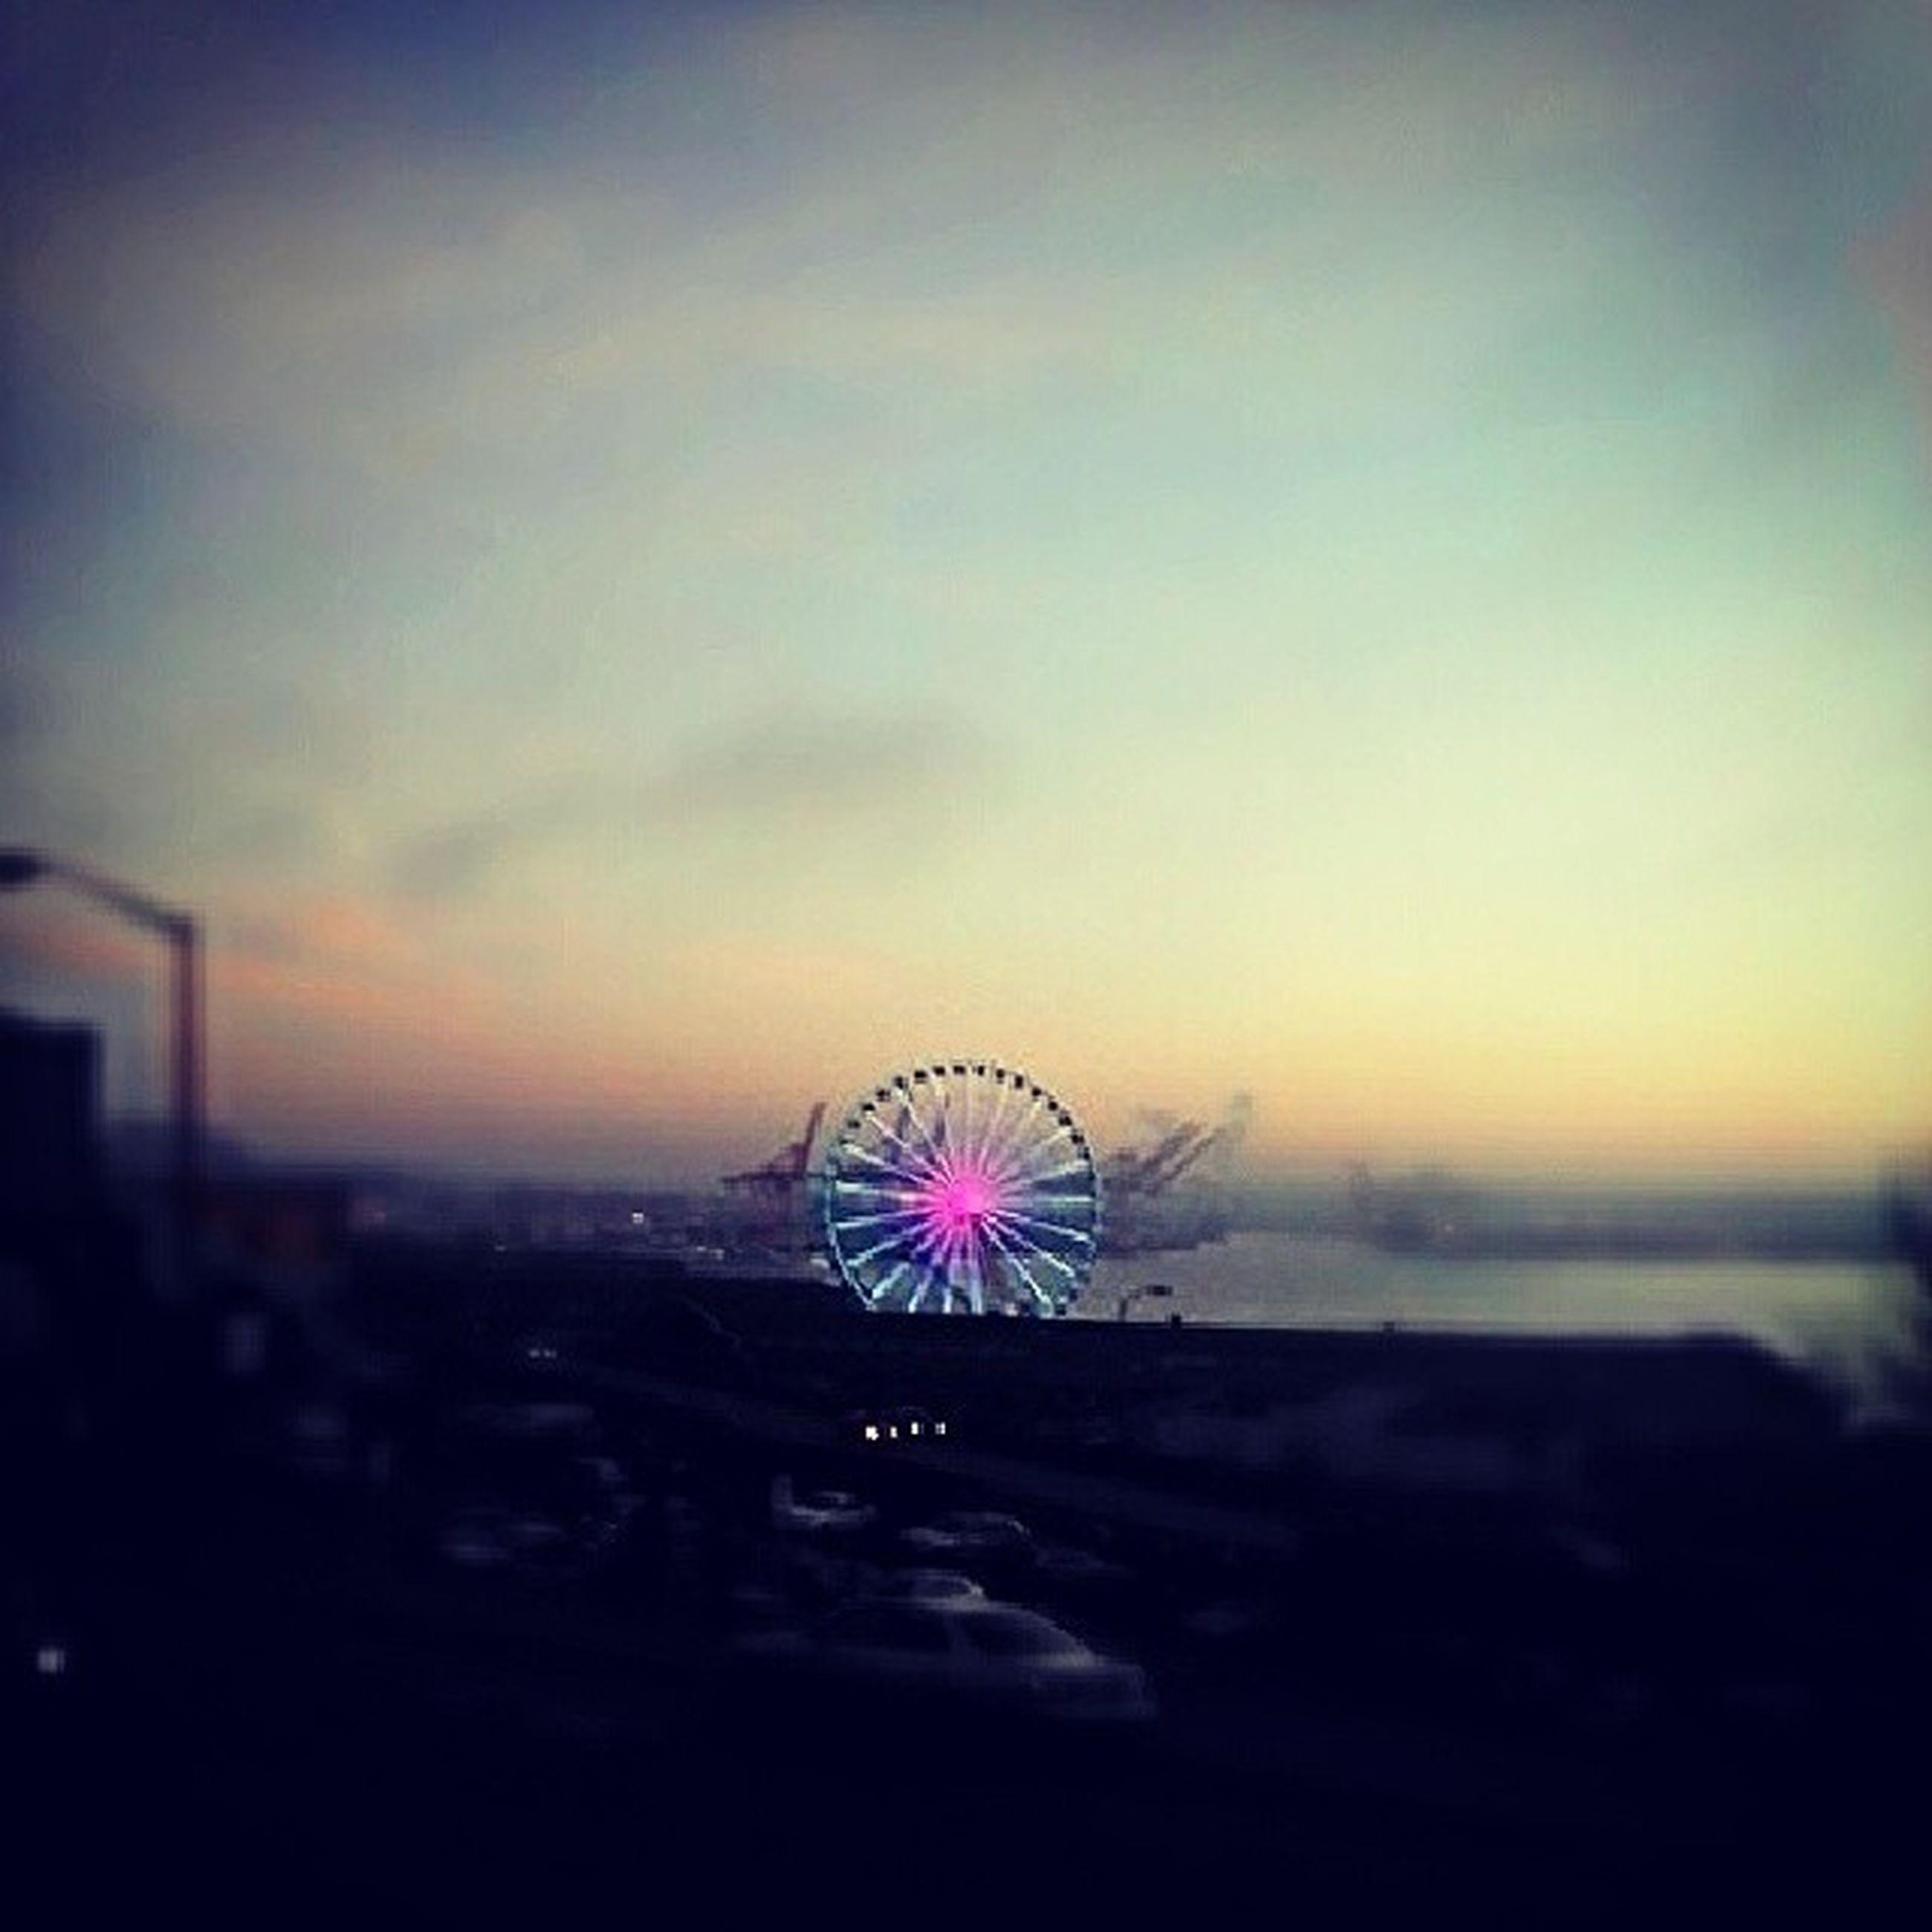 illuminated, ferris wheel, sky, arts culture and entertainment, night, amusement park ride, amusement park, multi colored, dusk, sunset, cloud - sky, outdoors, firework display, silhouette, architecture, no people, built structure, city, motion, long exposure